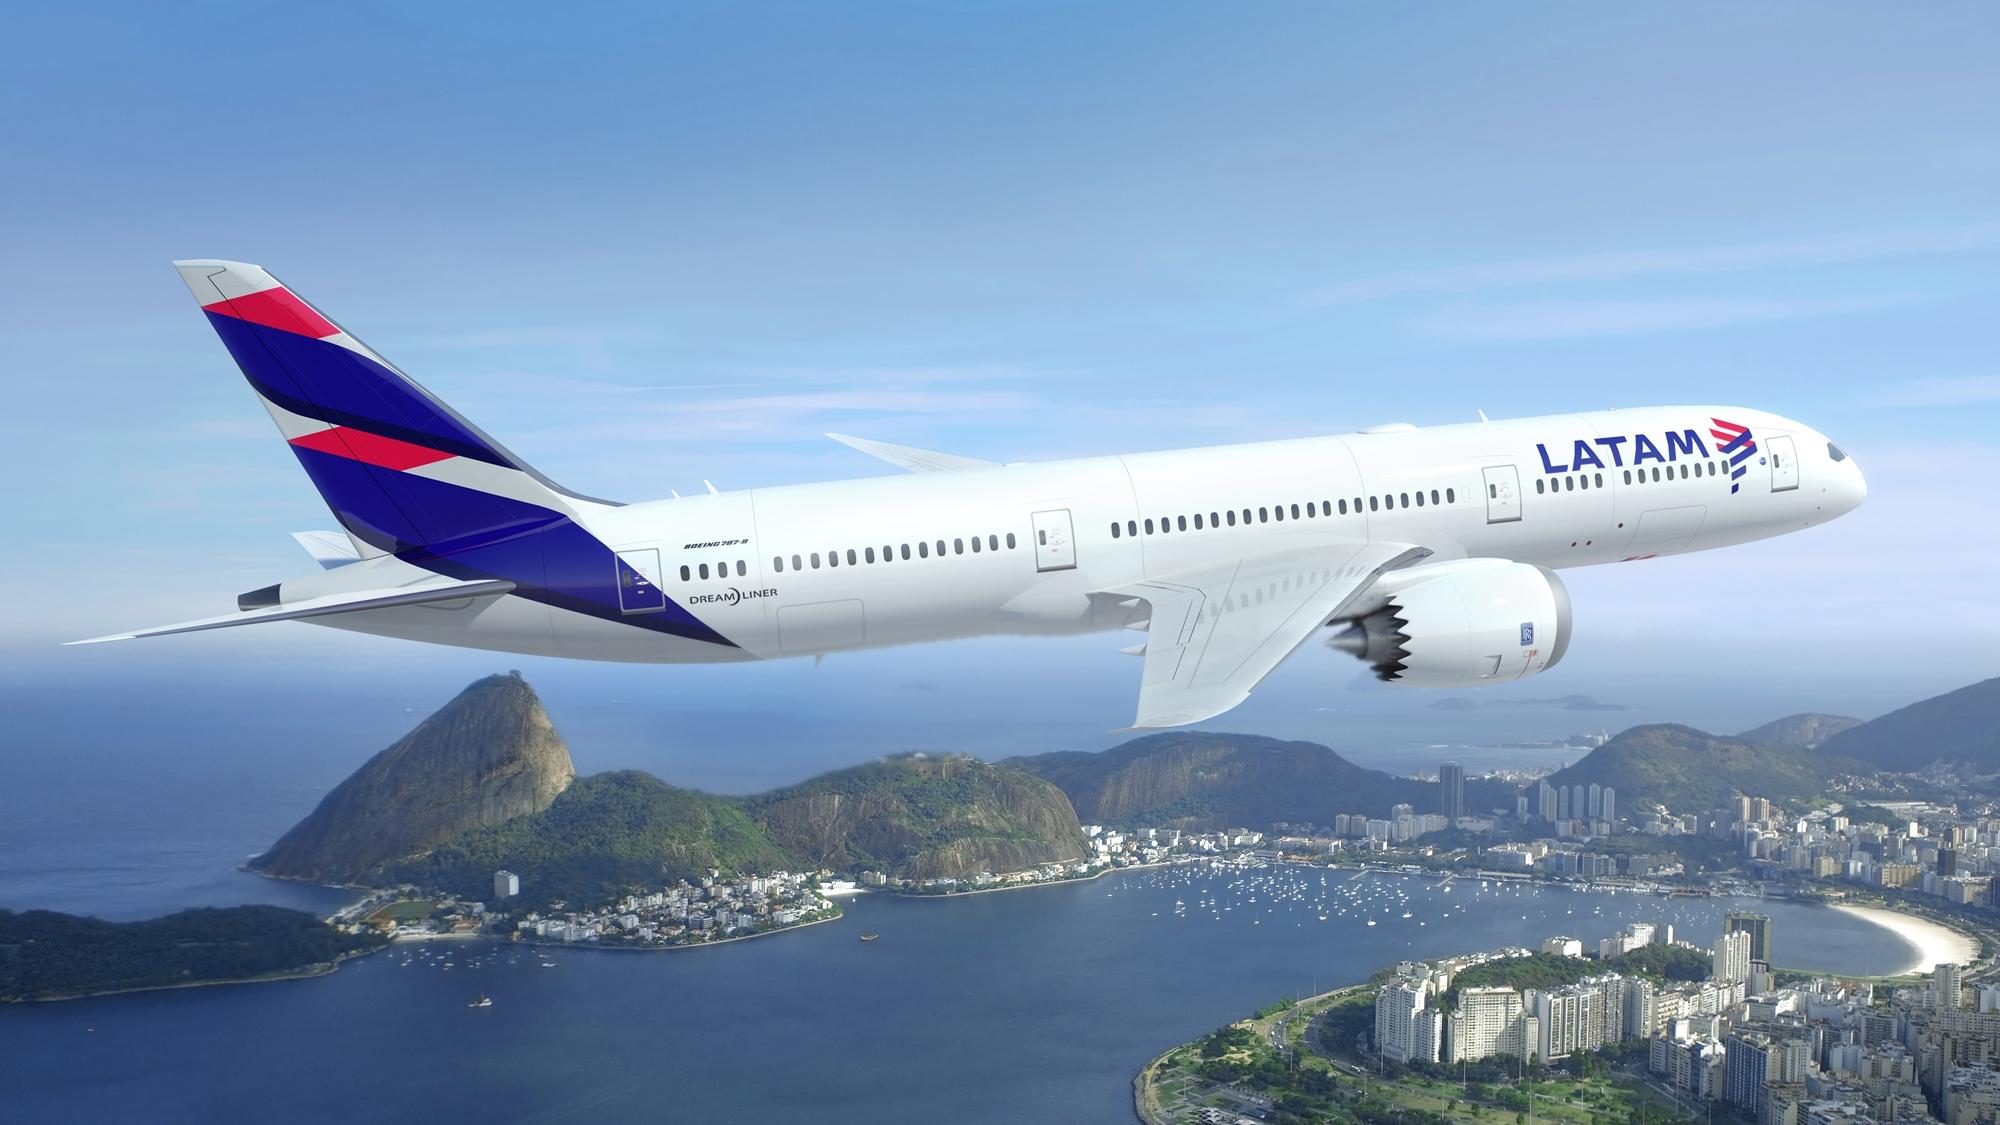 LATAM Airlines pierde 2,120 mdd en primer trimestre por pandemia